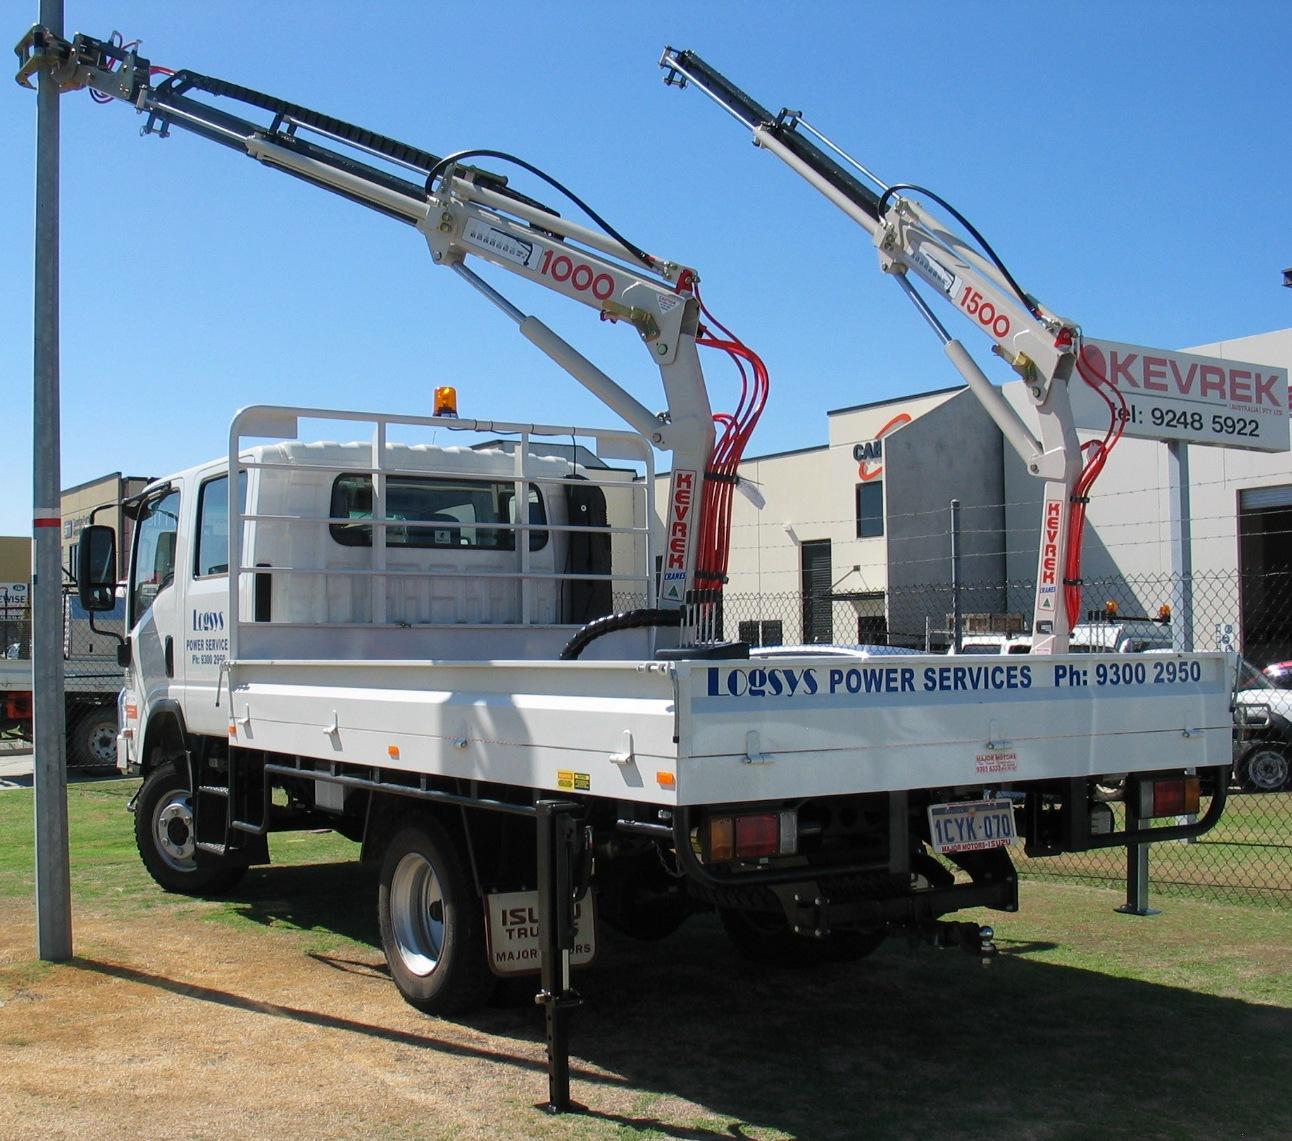 Logsys Double Crane (1)